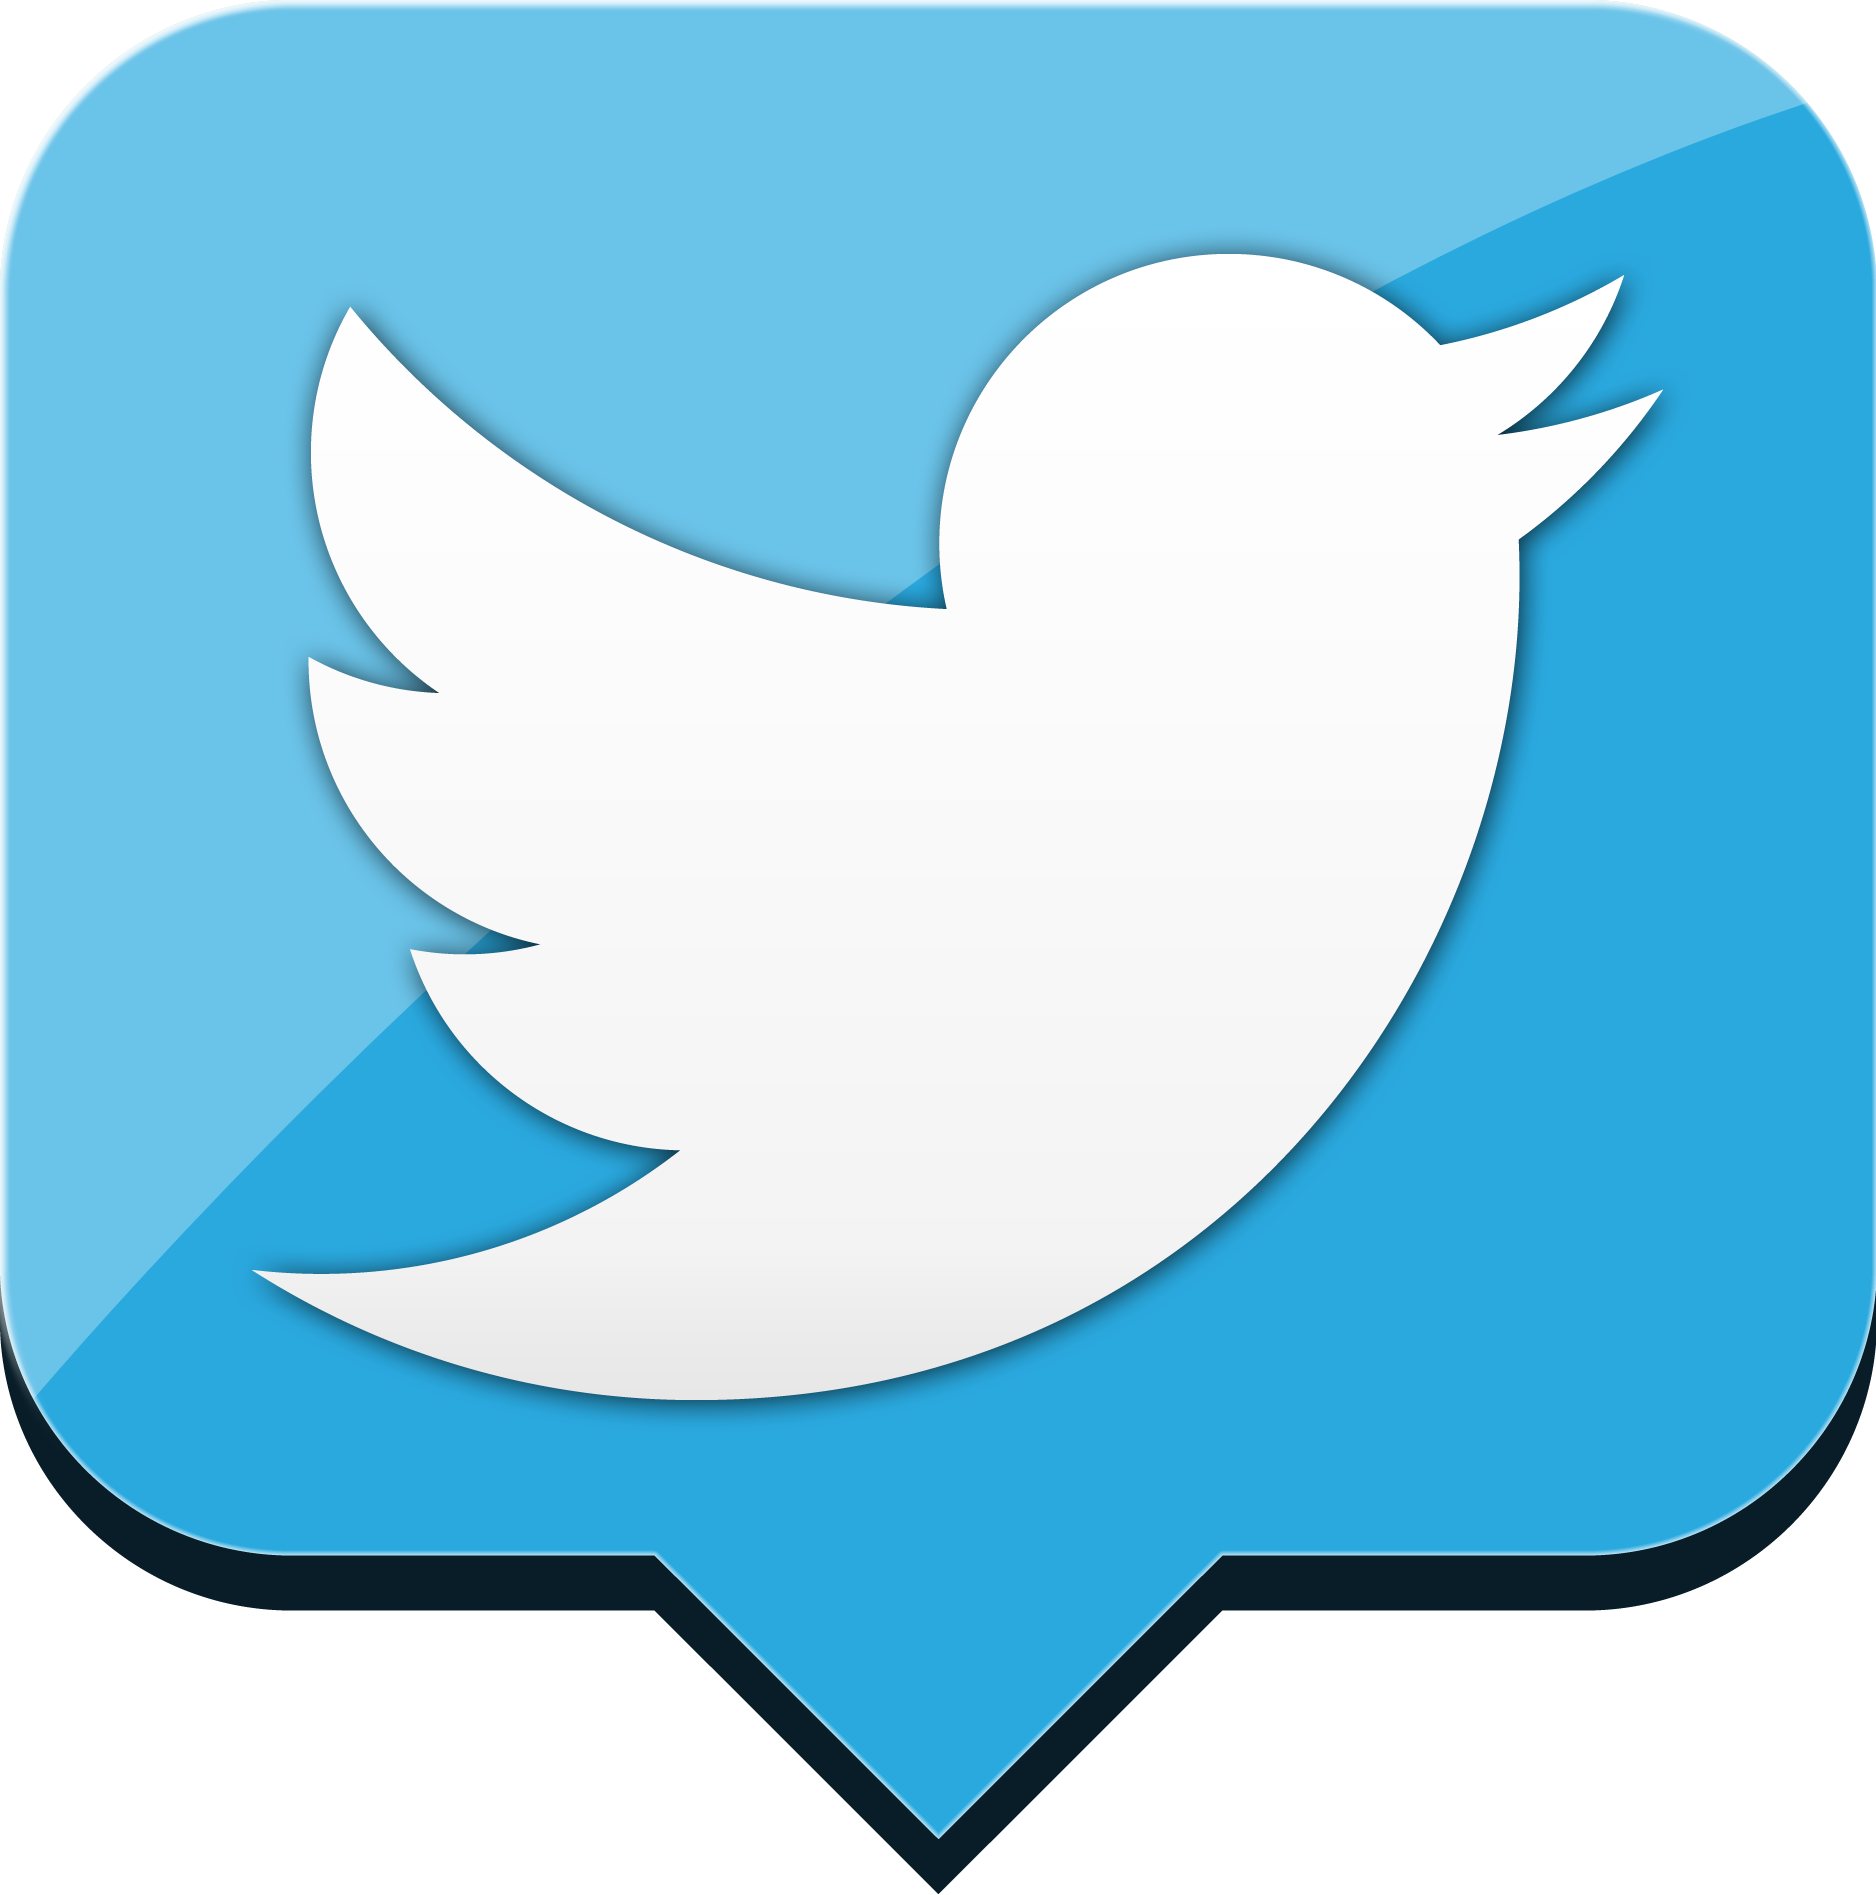 i want 1000 twitter followers